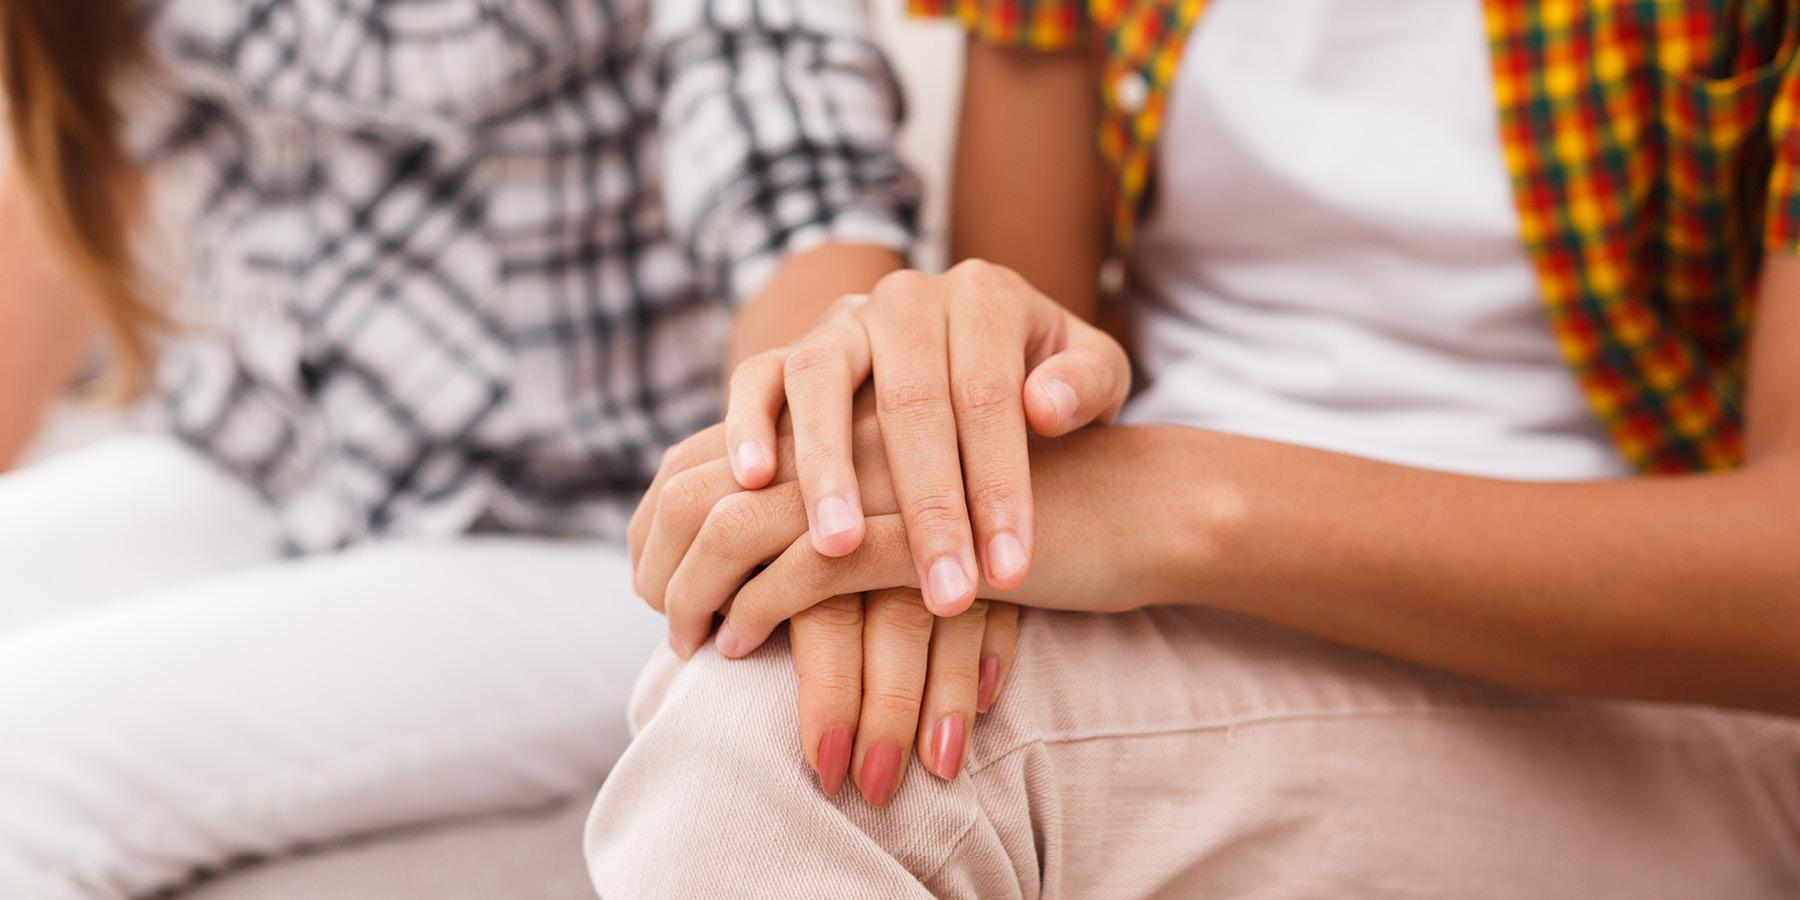 Closeup of women's hands